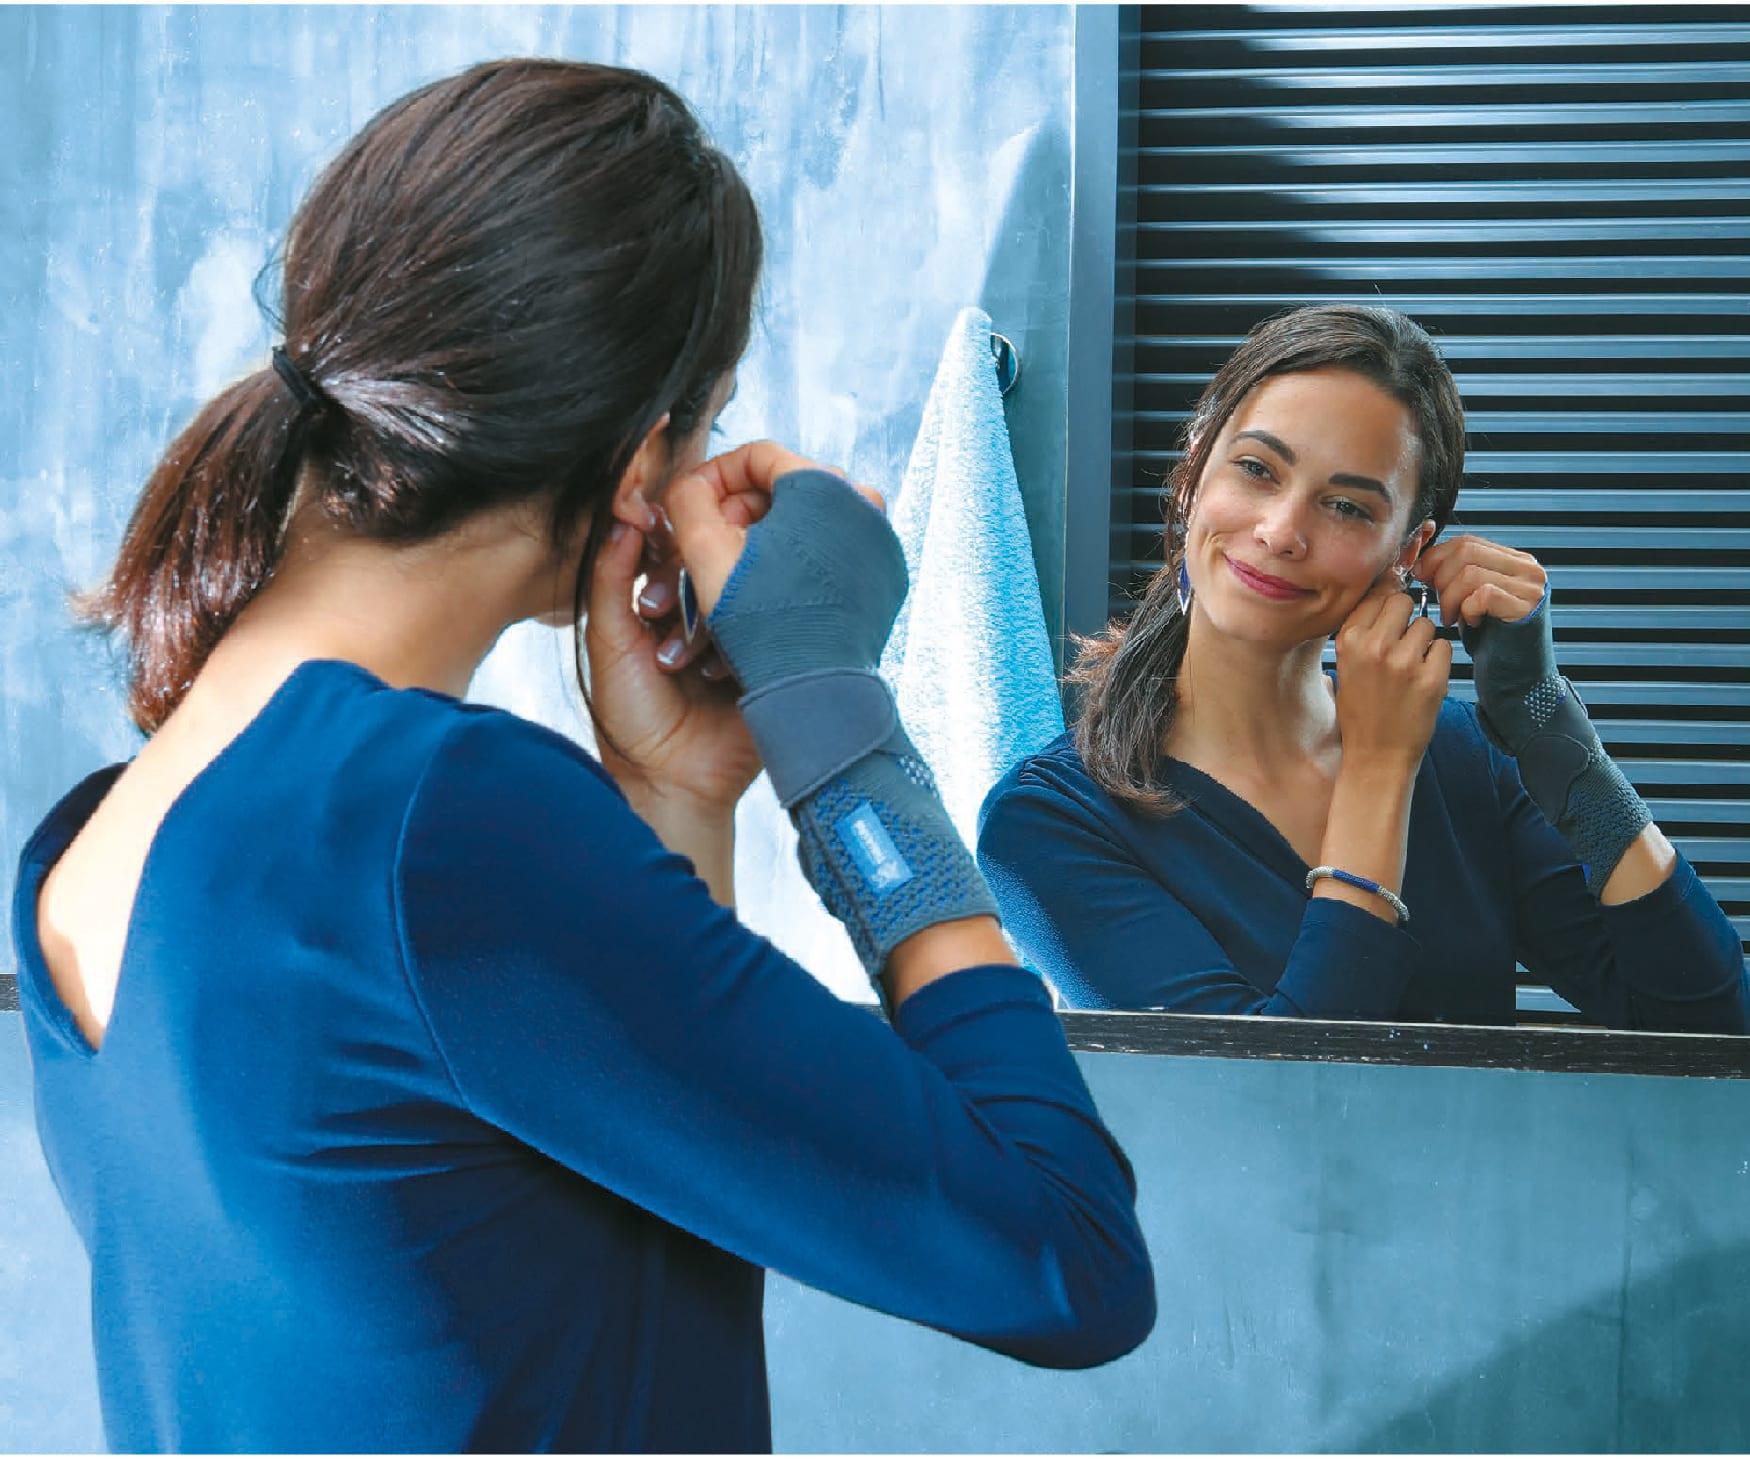 Woman wearing a Thuasne Wrist Brace